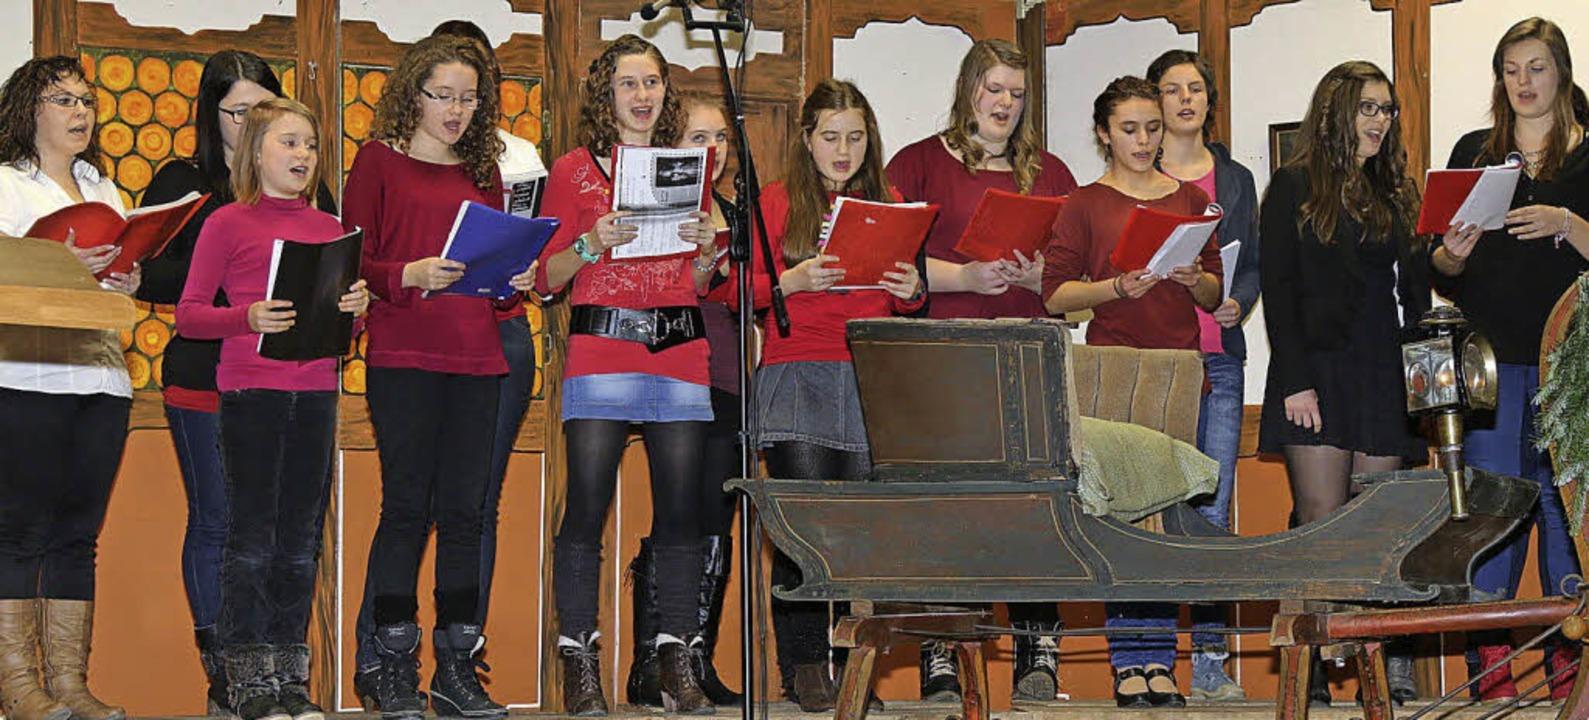 Großen Anklang fand der Auftritt des Jugendchores.    Foto: Hans-Jürgen Hege